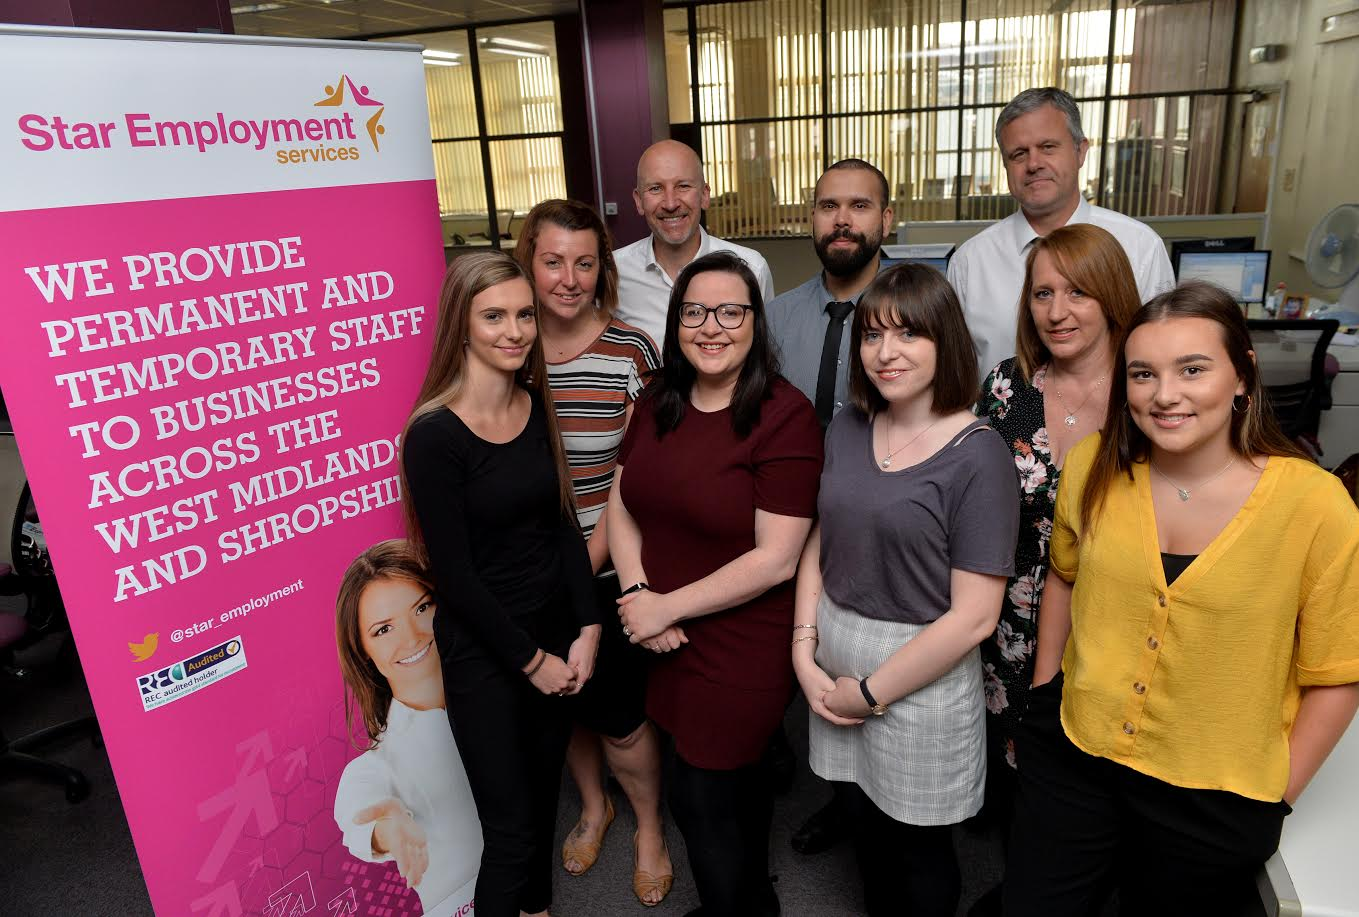 Star Employment Services Recruitment Agency West Midlands Wolverhampton